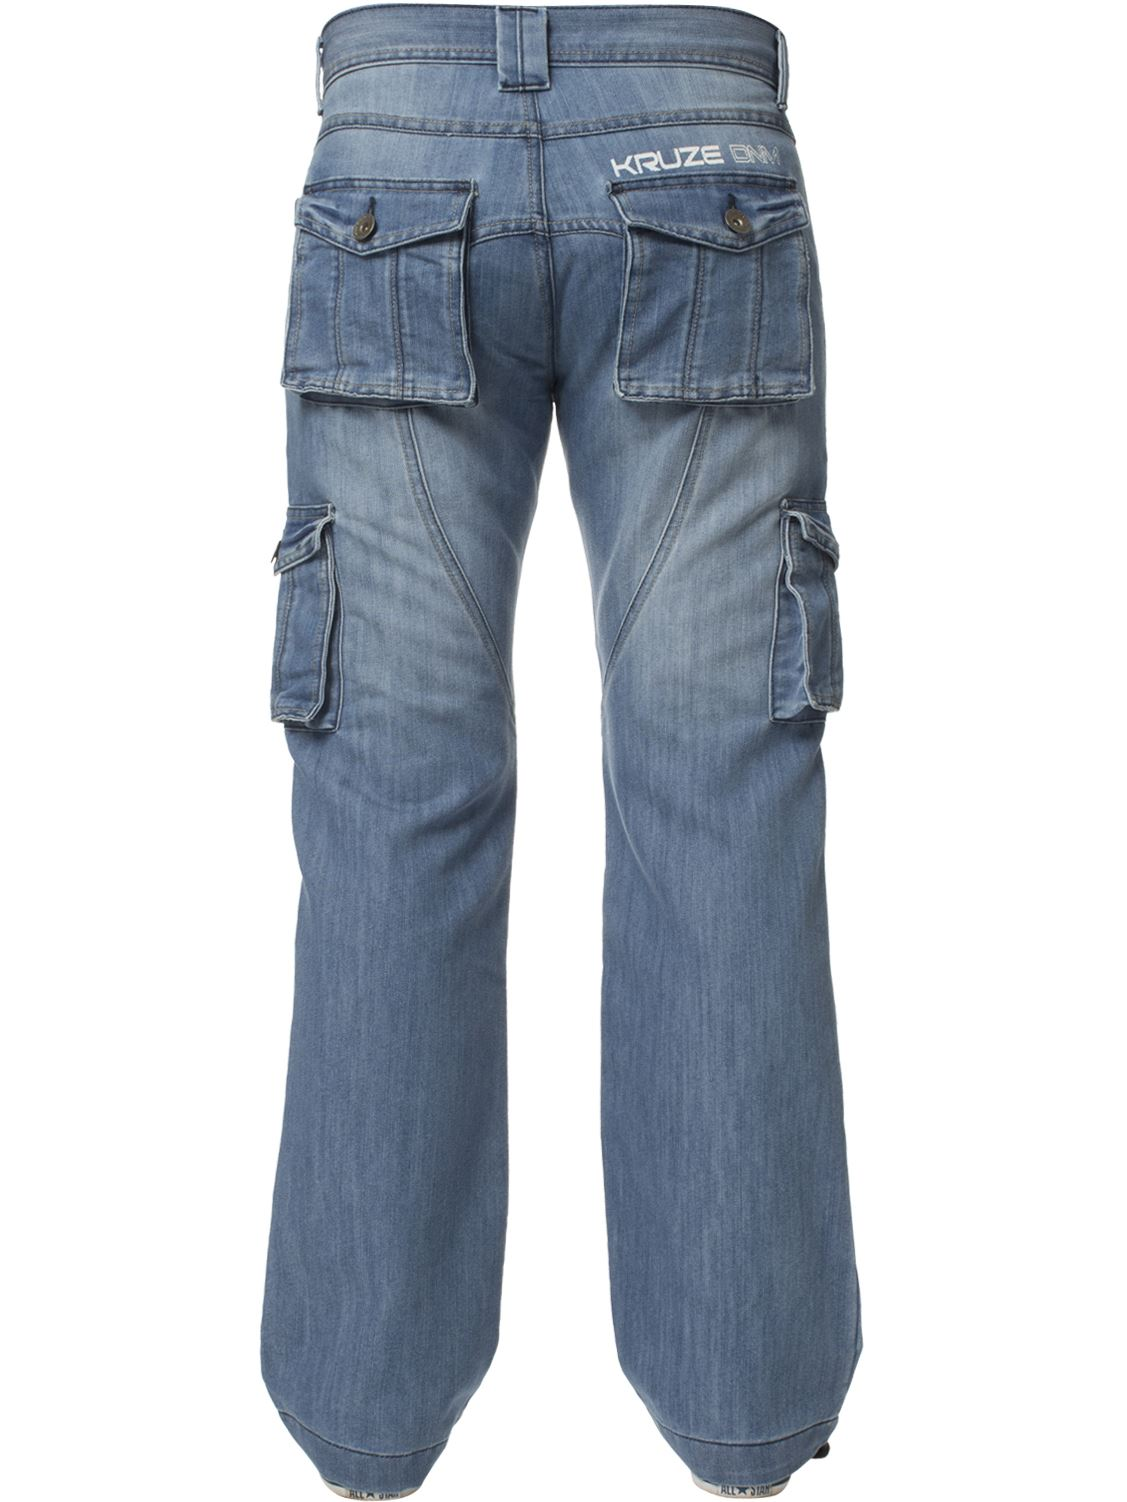 Grandes-jeans-para-hombre-de-combate-de-Kruze-Rey-Alto-Pierna-Cargo-Pantalones-Jeans-Pantalones miniatura 28